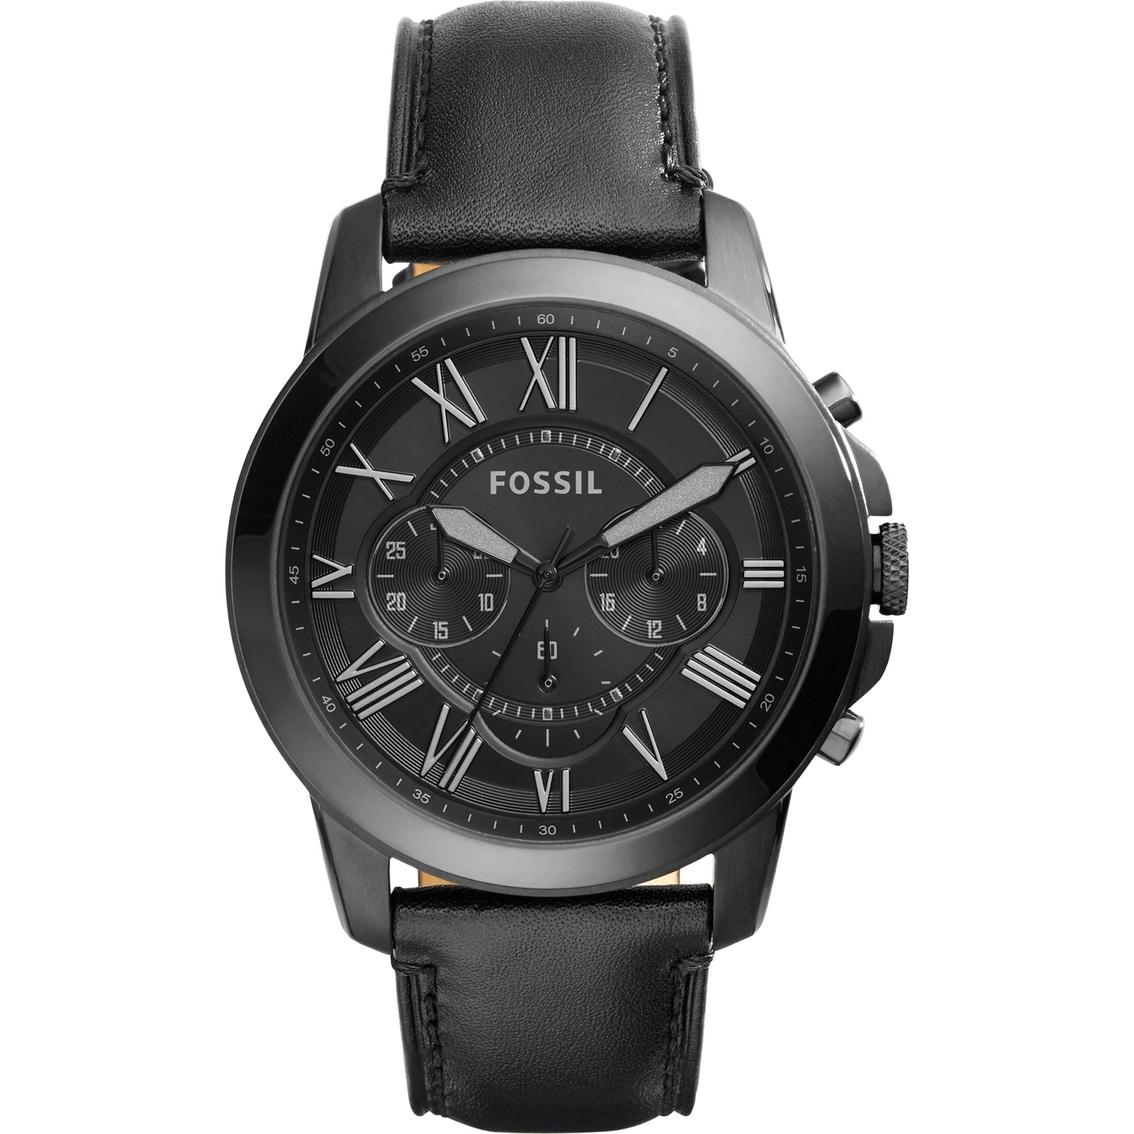 7deba0b461da Fossil Men s Grant Chronograph Black Leather Watch Fs5132